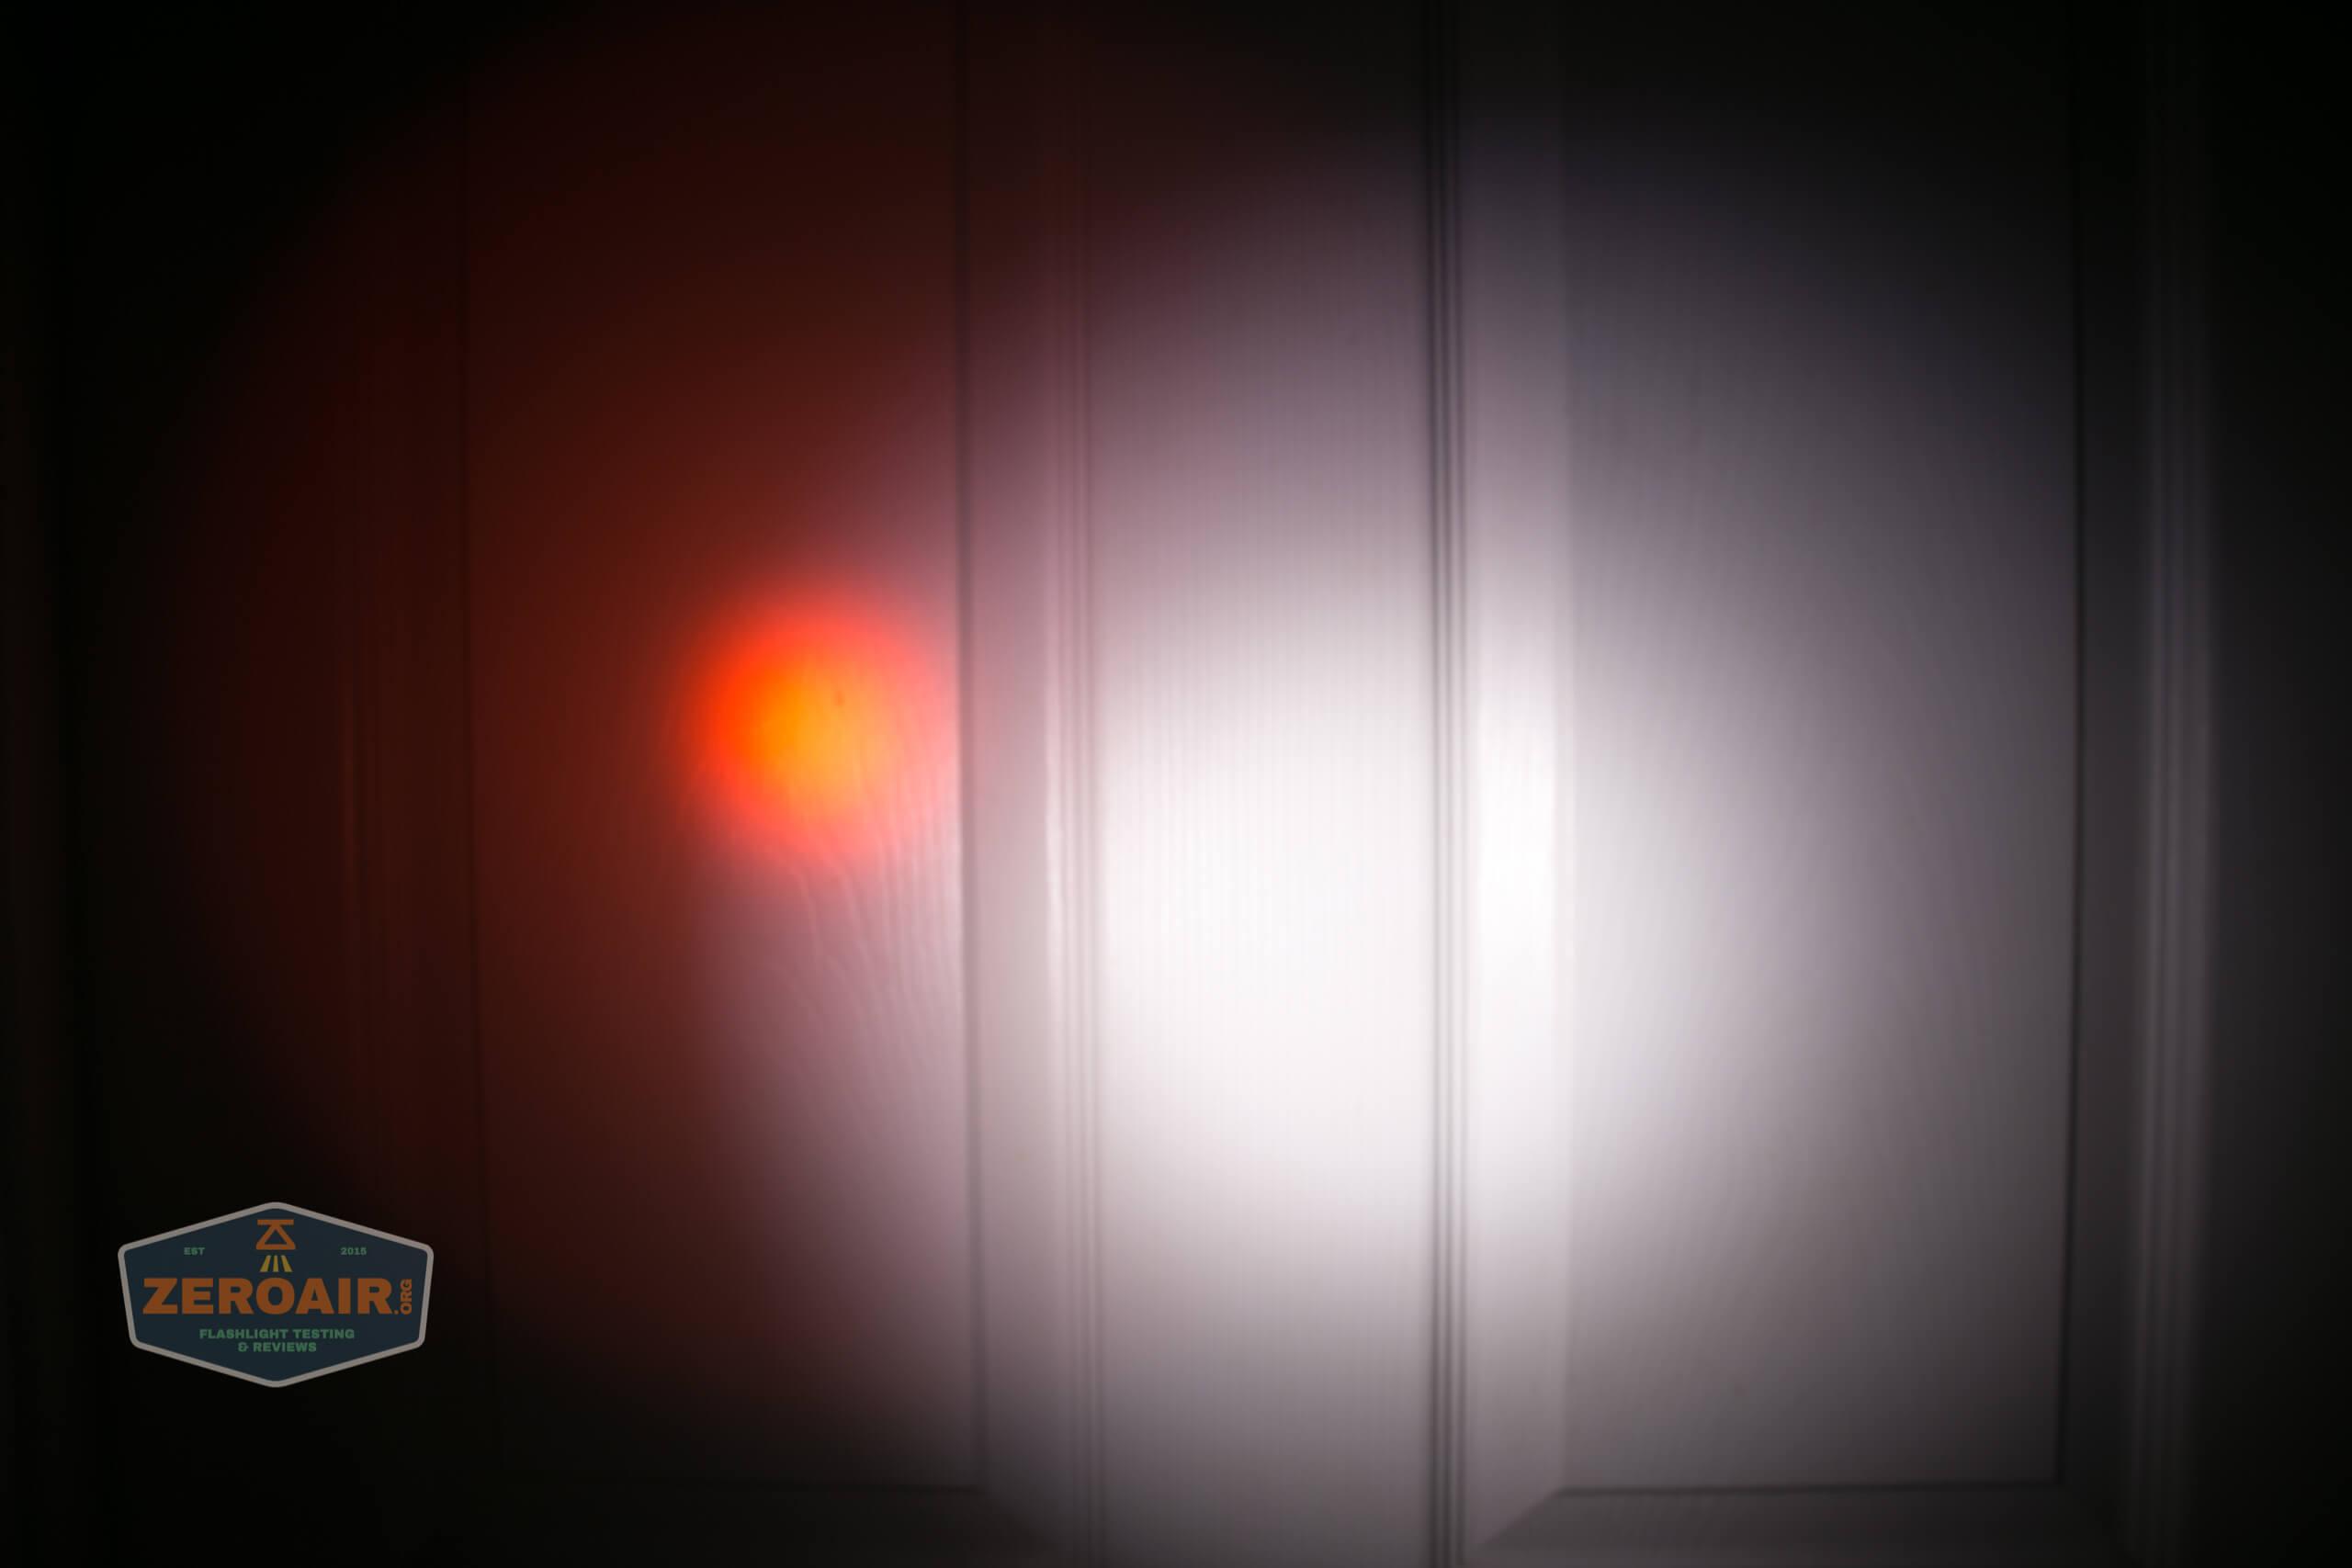 cyansky h3 beamshot door red 1